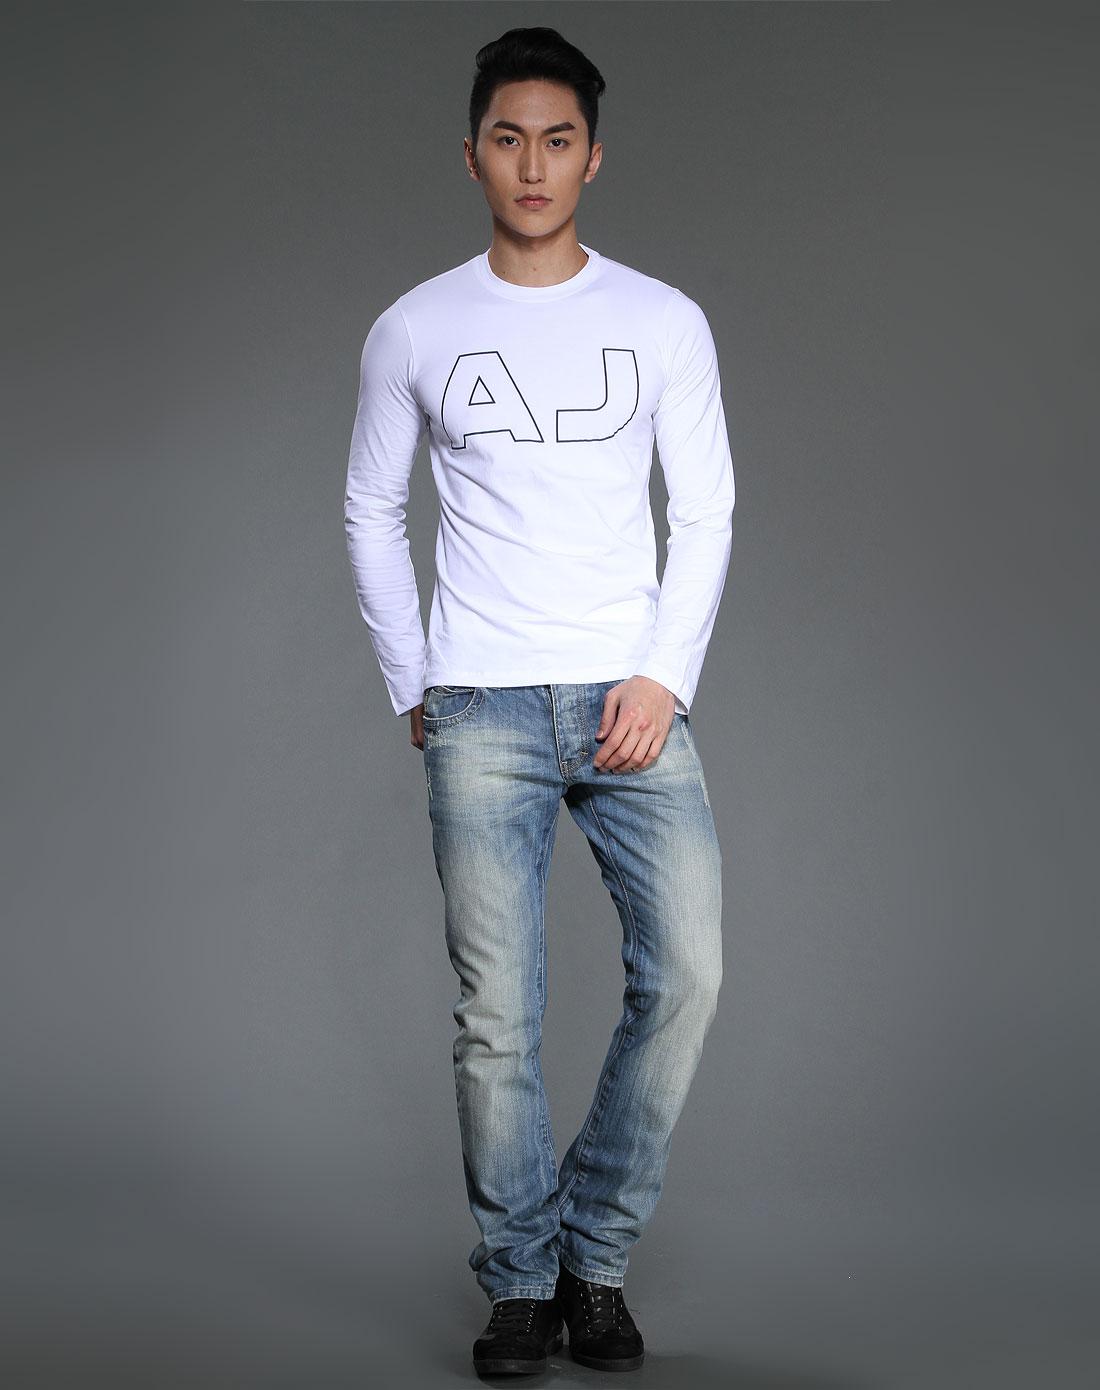 armani aj 男款印大logo长袖t恤白色